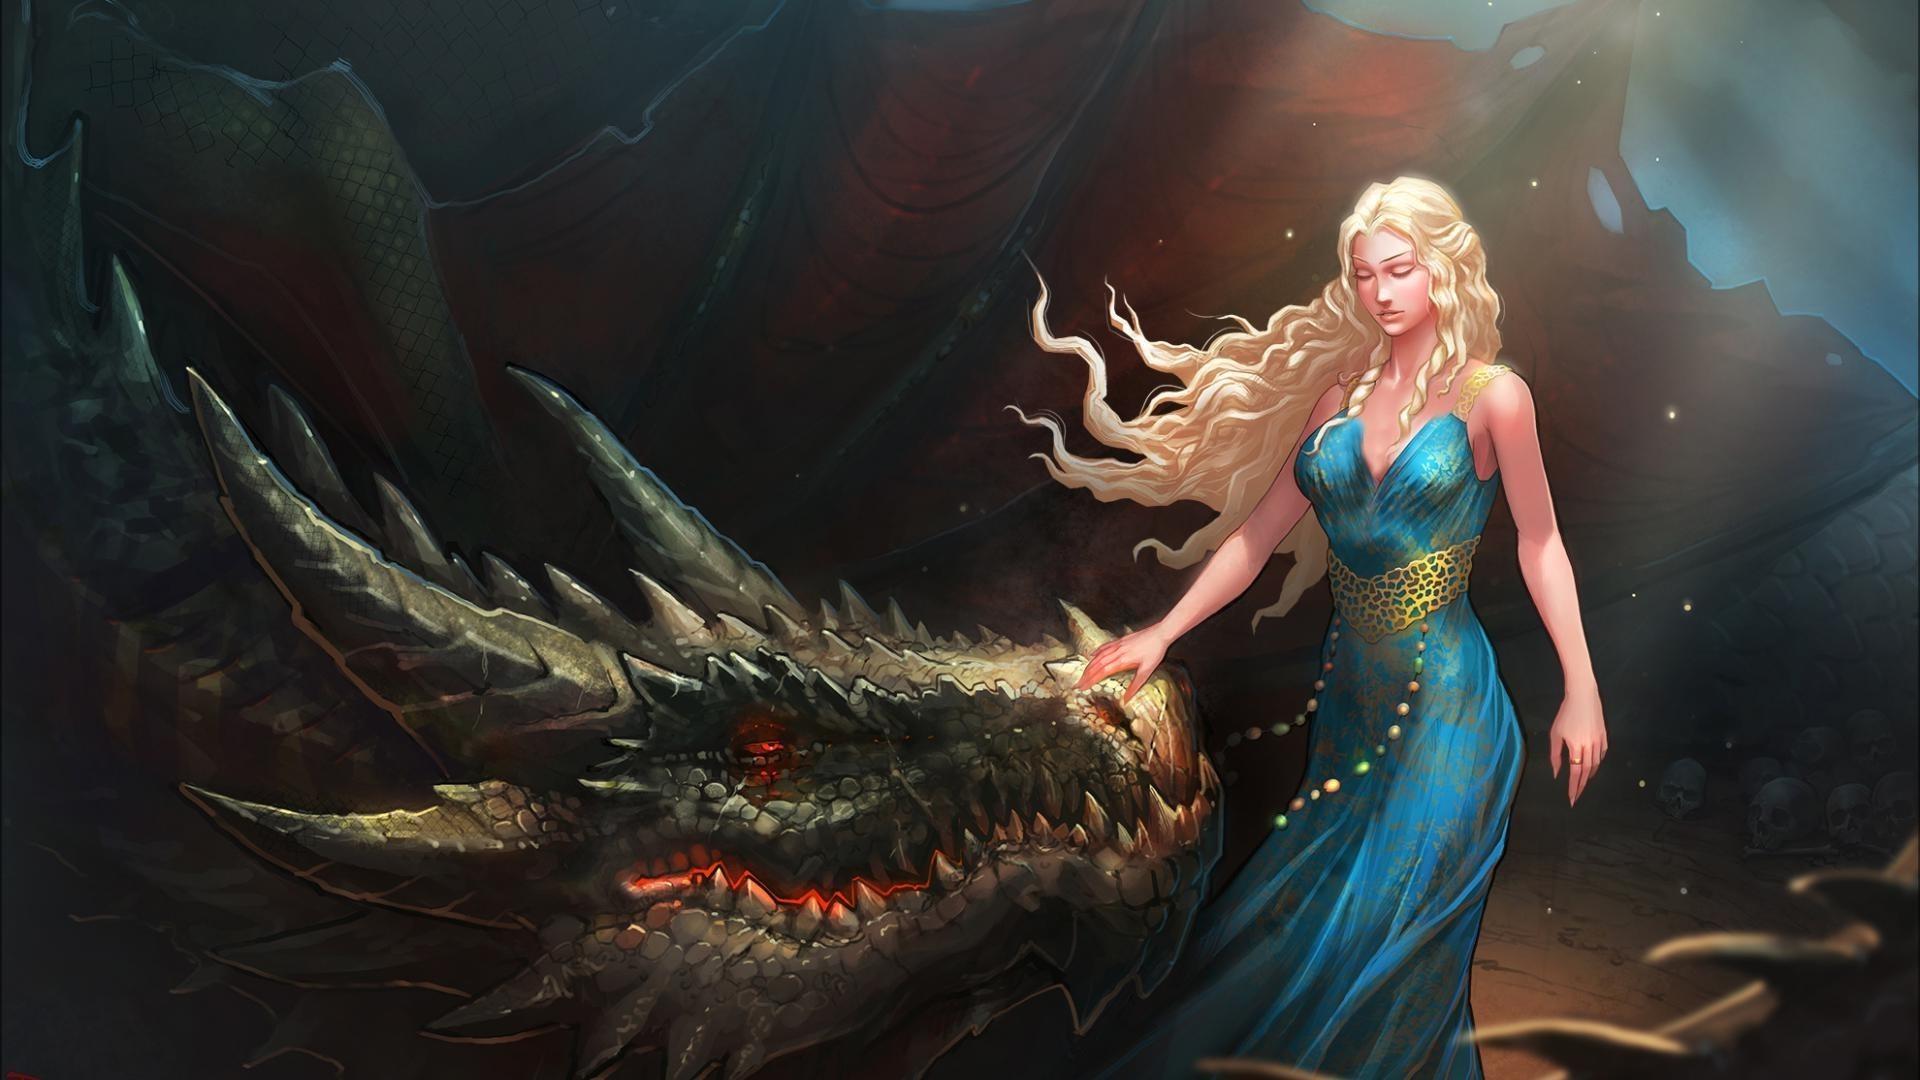 women, Blonde, Long Hair, Closed Eyes, Daenerys Targaryen, Digital Art,  Fantasy Art, Dragon, Nature, Blue Dress, Fan Art, Game Of Thrones Wallpaper  HD